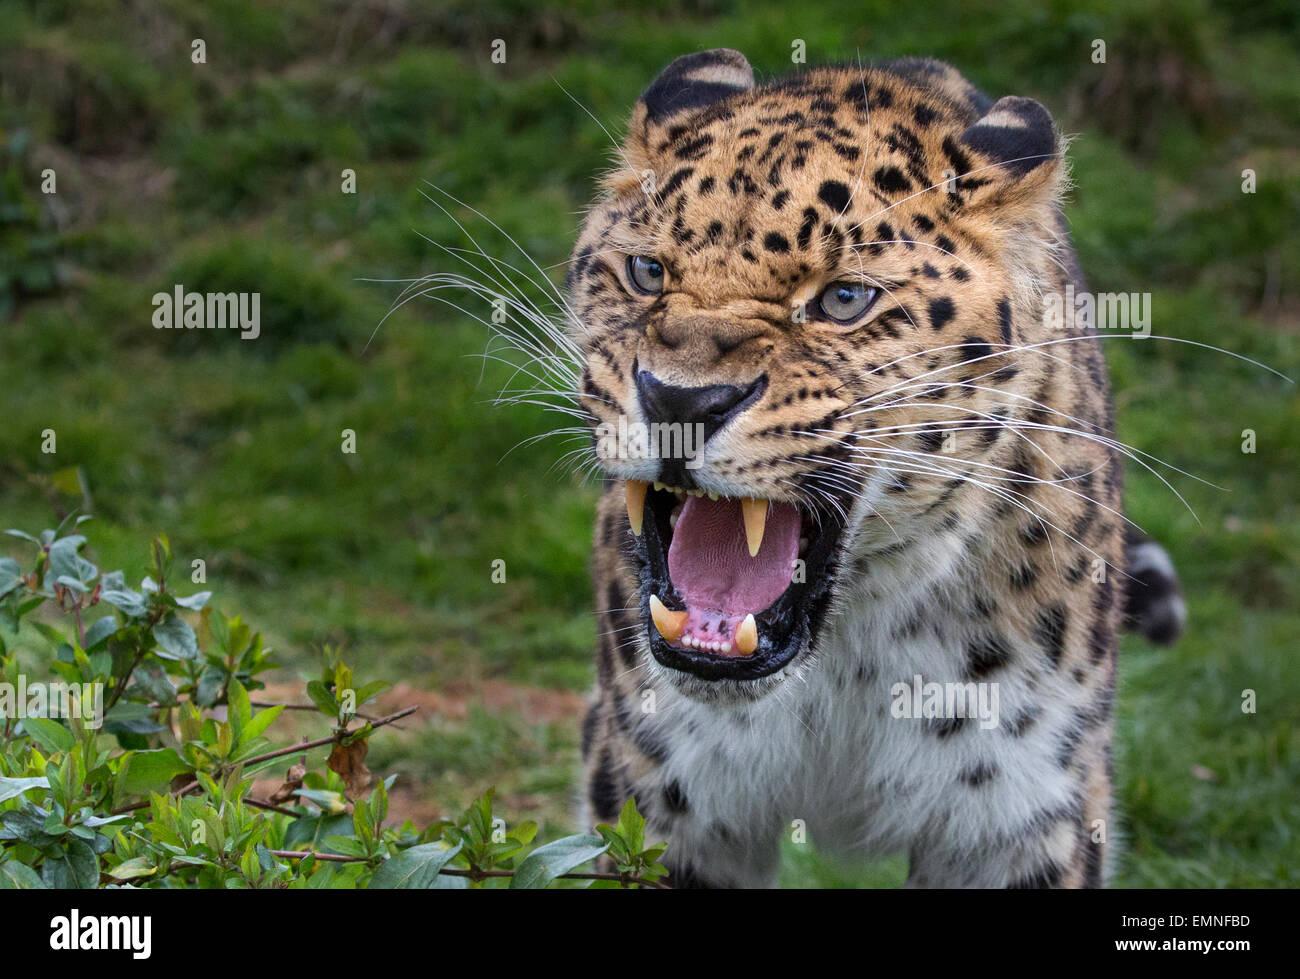 Growling Amur Leopard - Stock Image